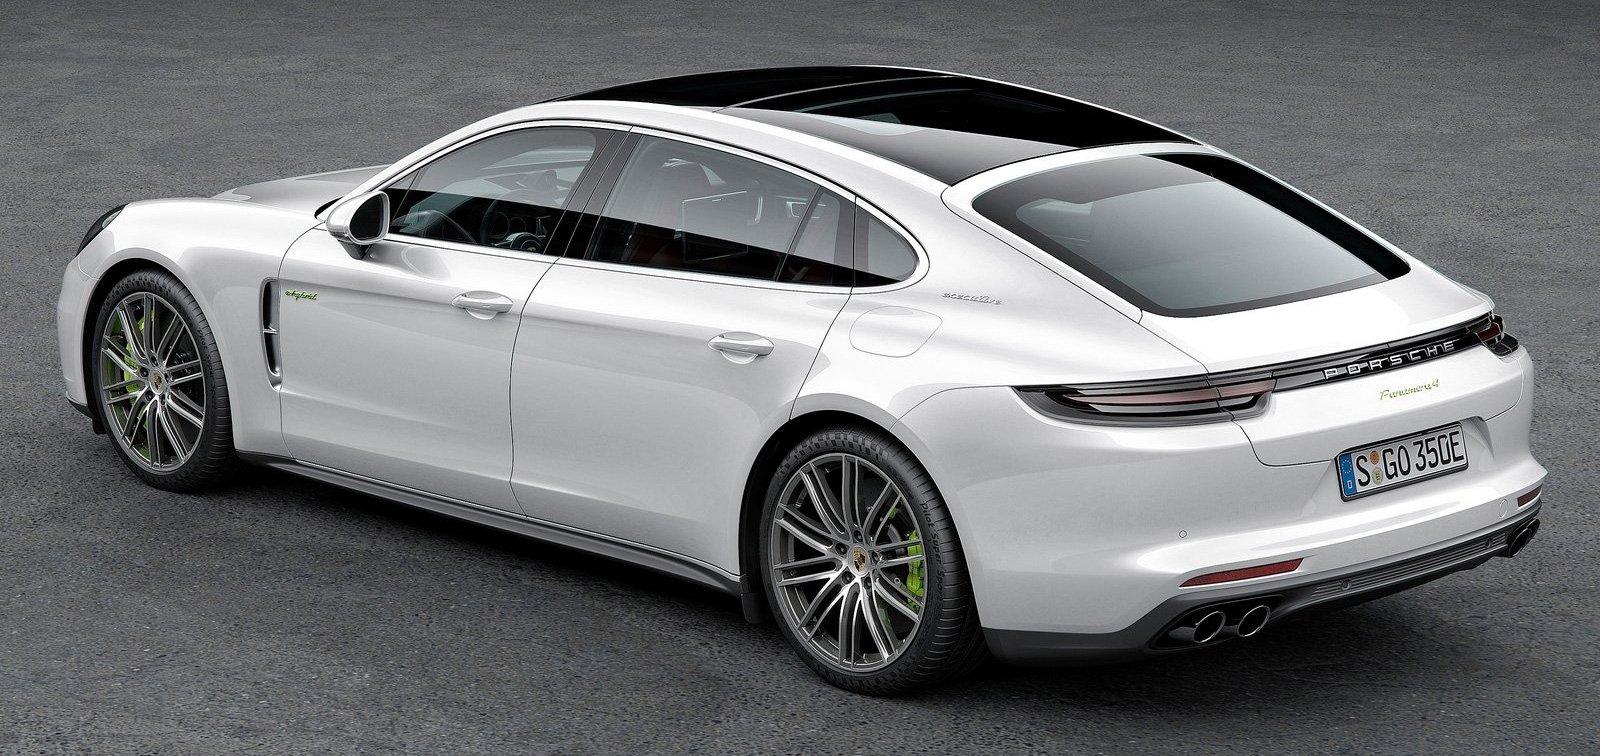 2017 Porsche Panamera Executive 150 Mm Longer Wb Image 577765